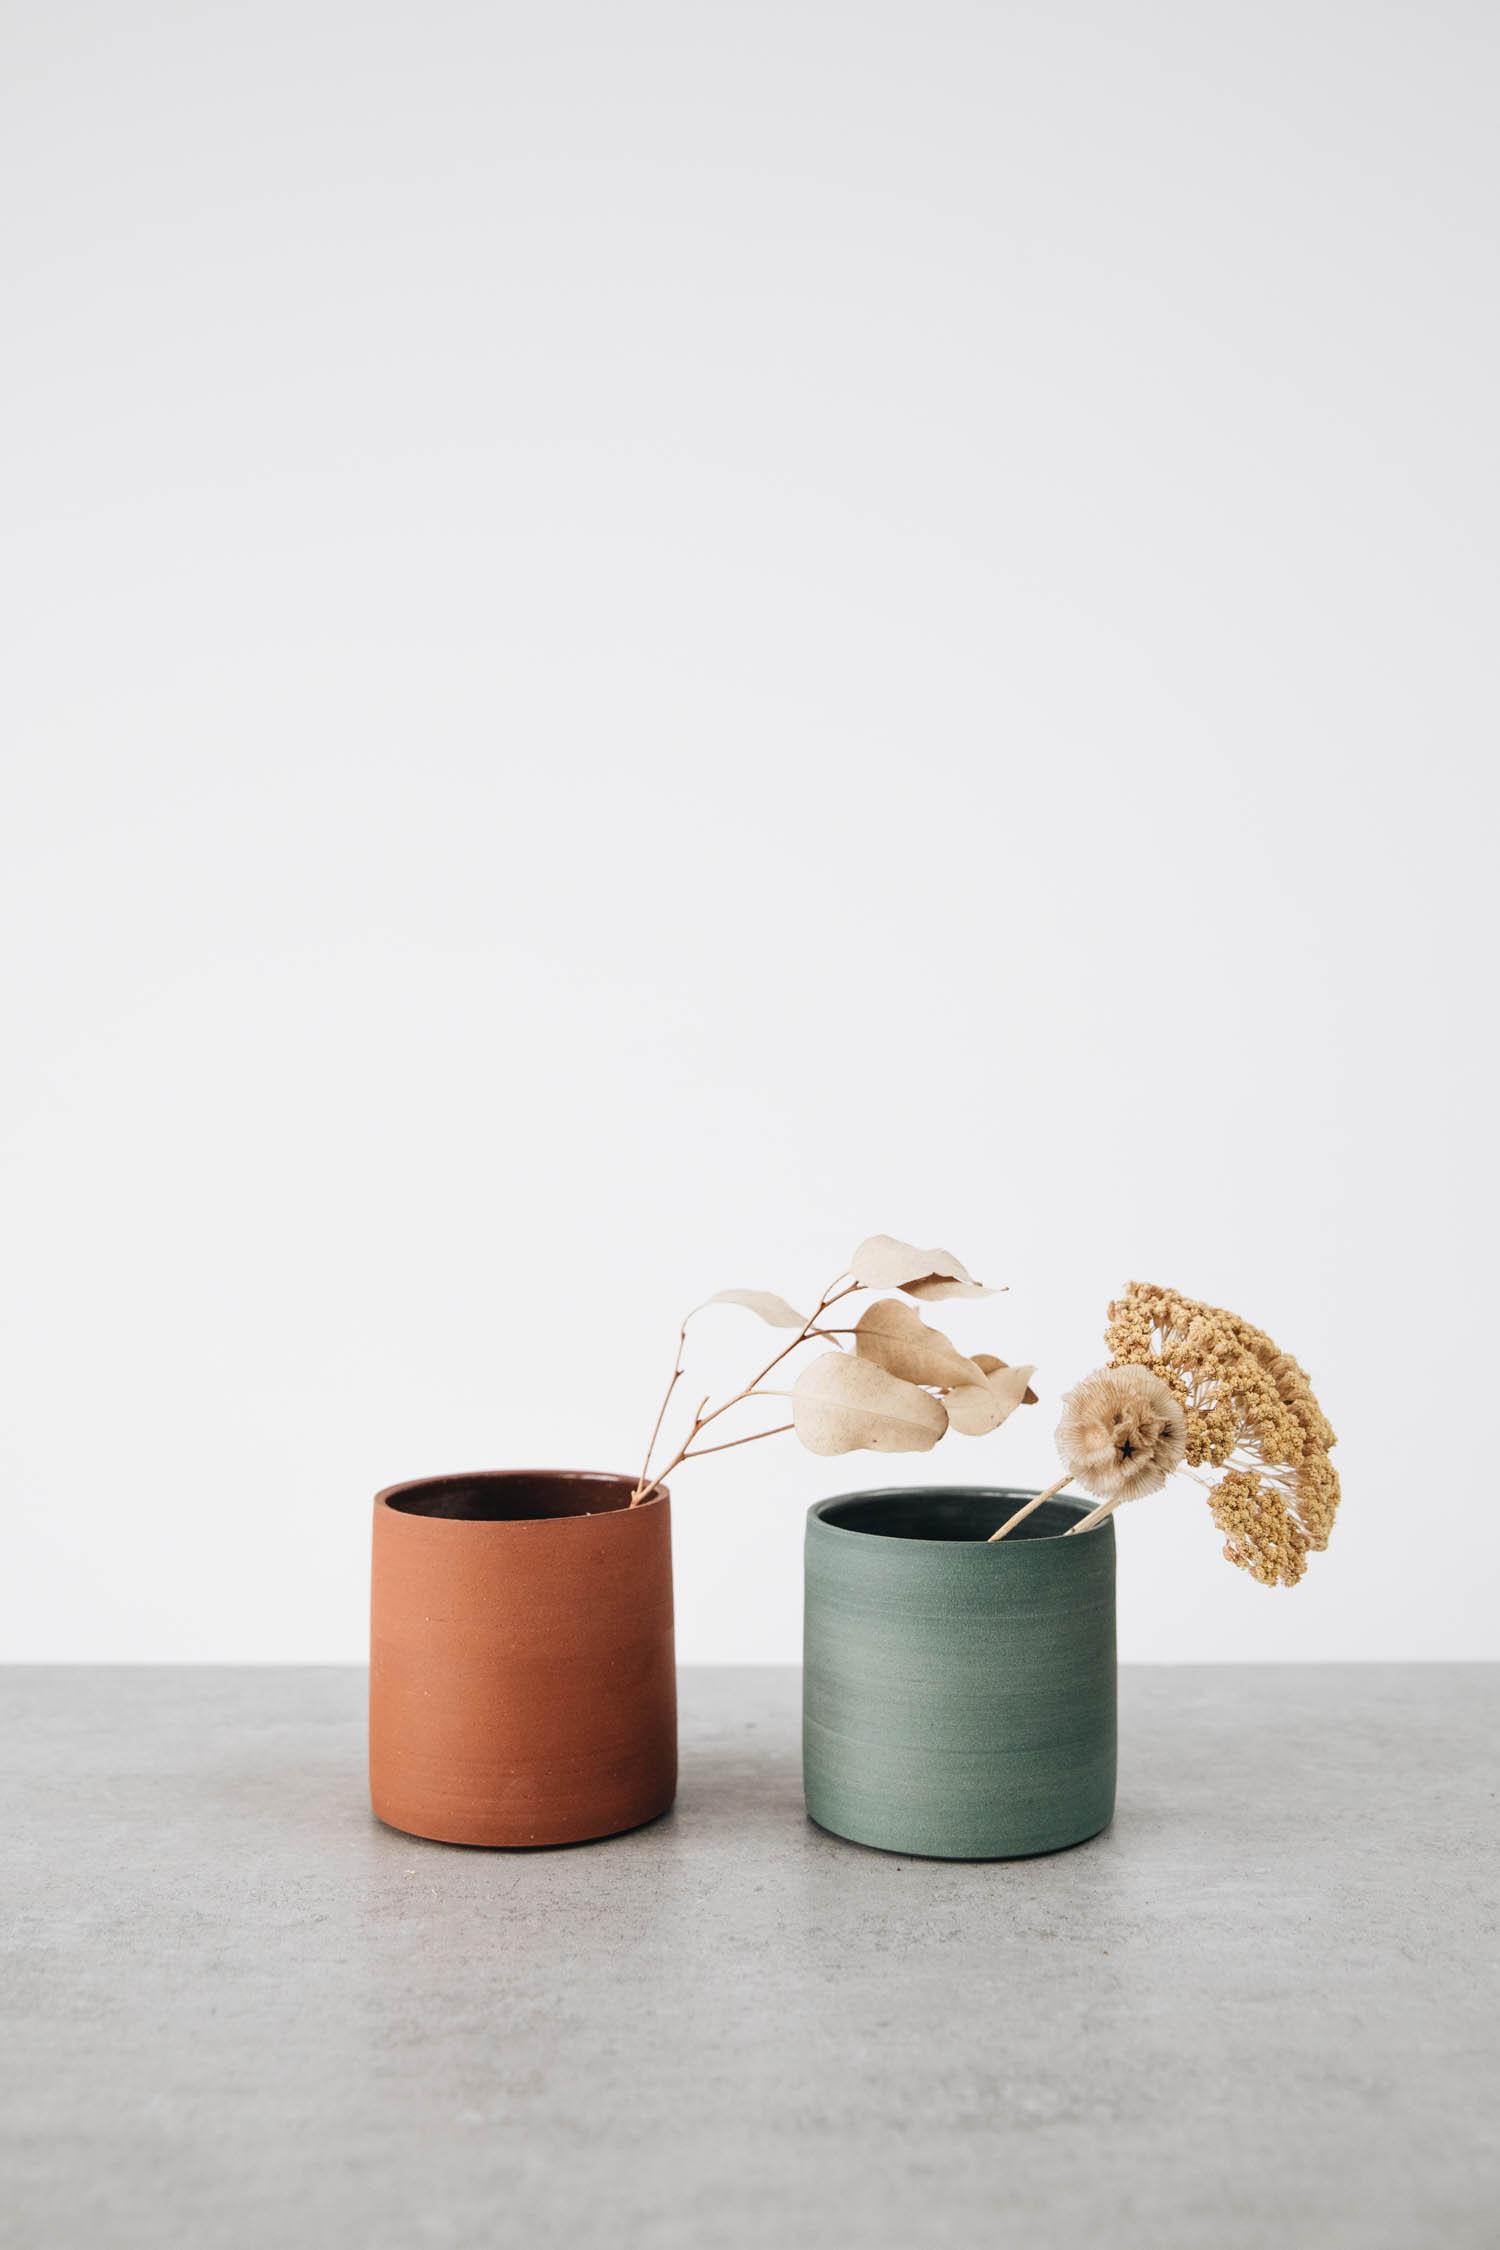 AR. Ceramics